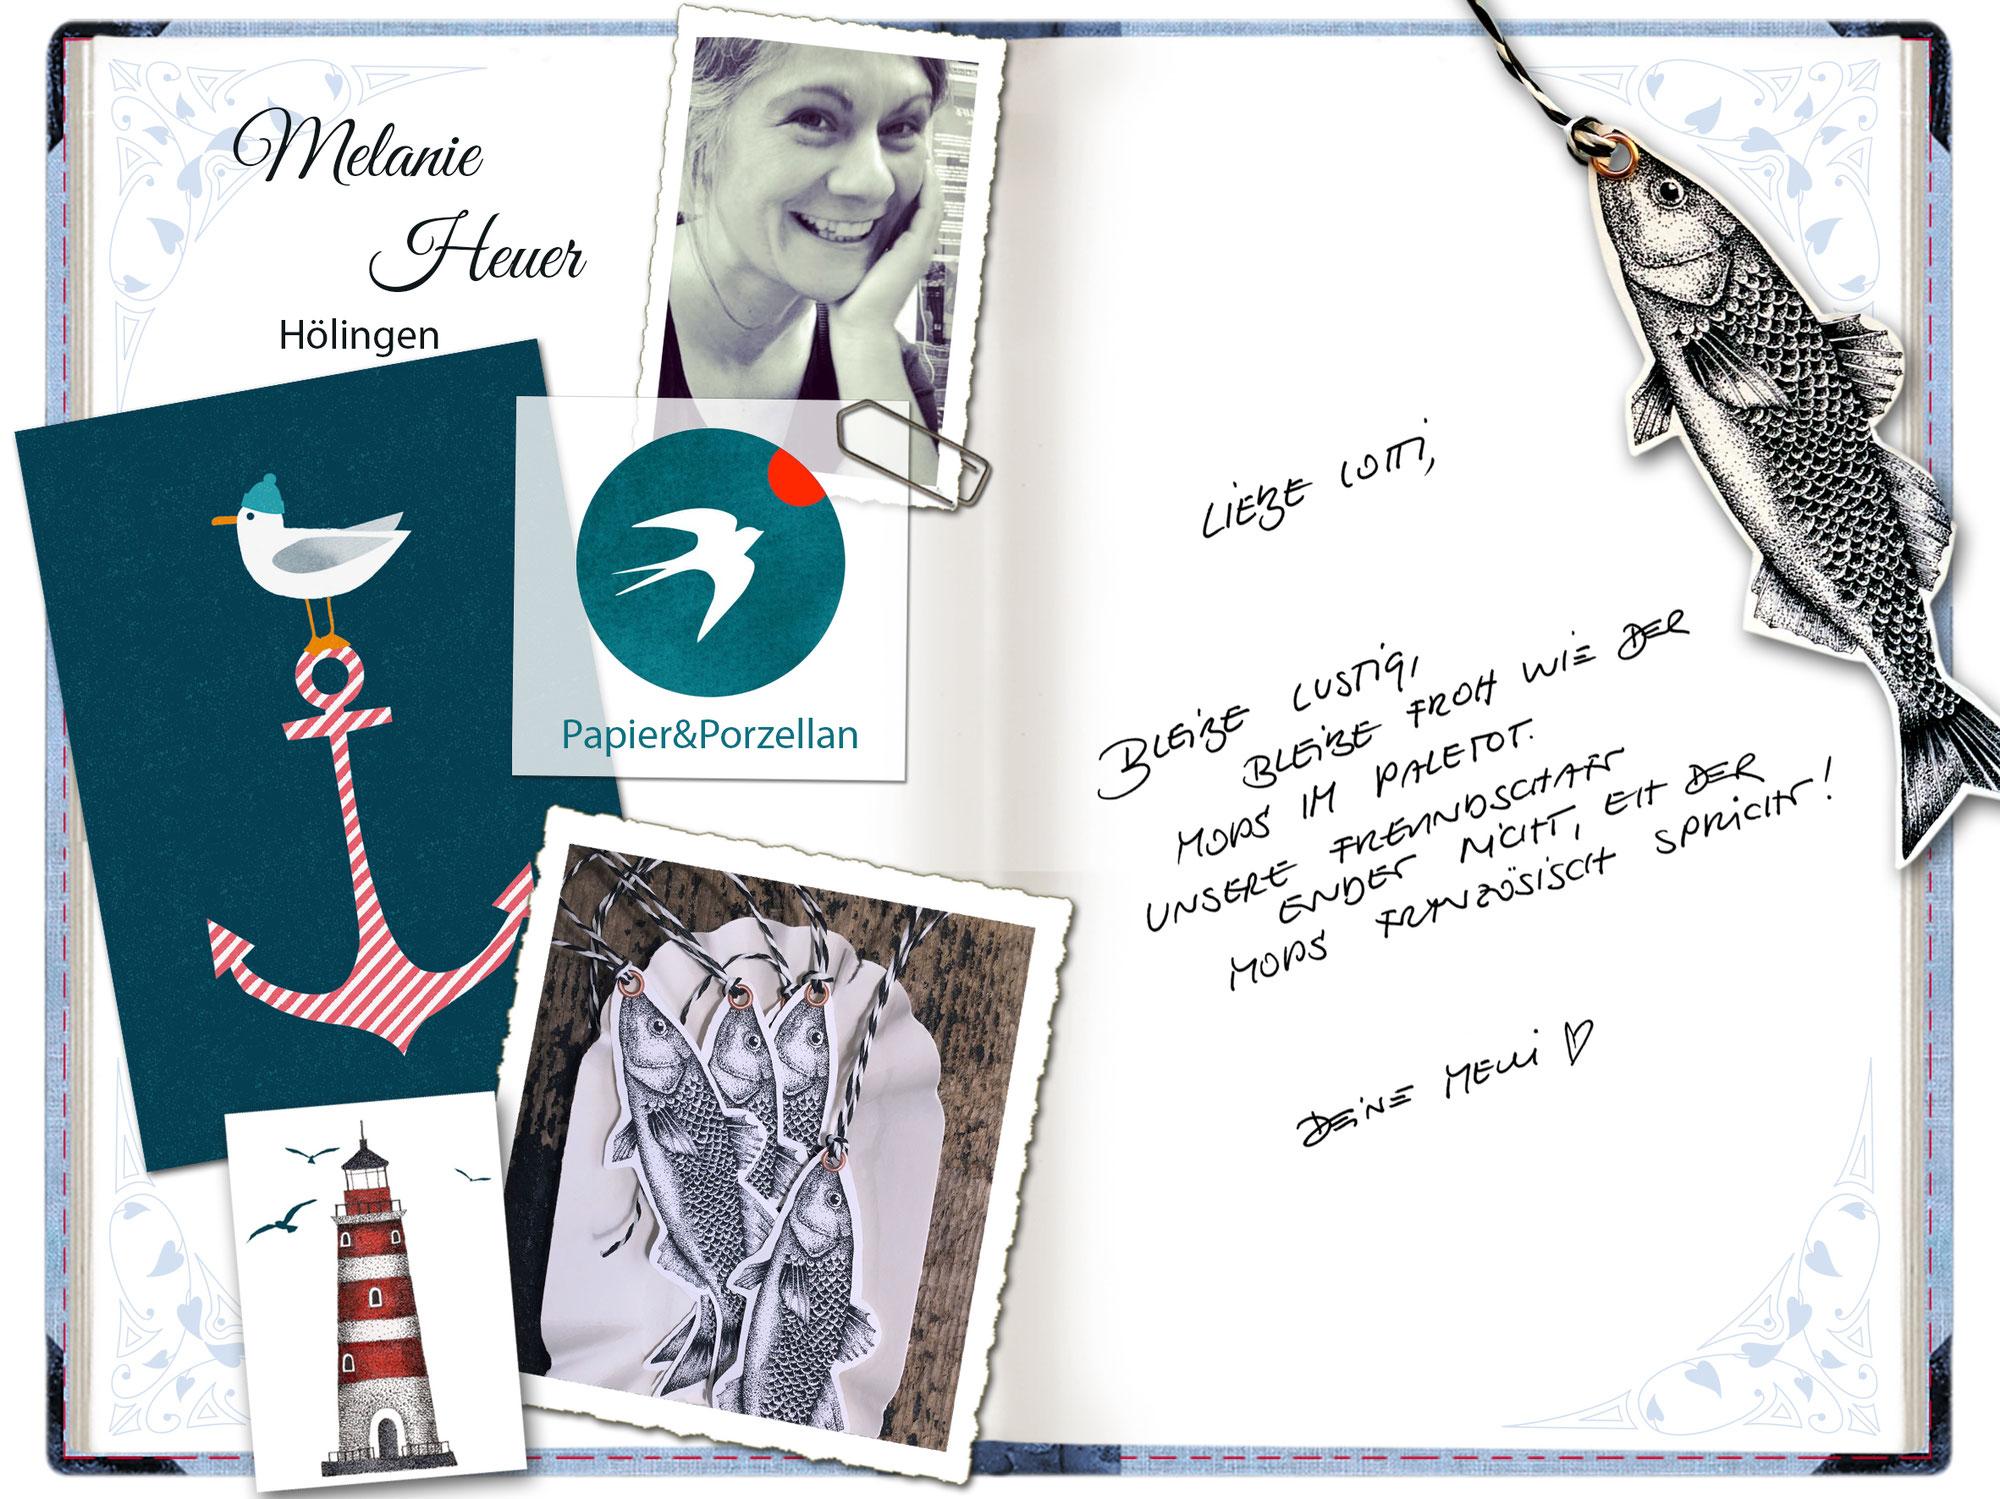 Melanie Heuer in Lottis Poesiealbum!